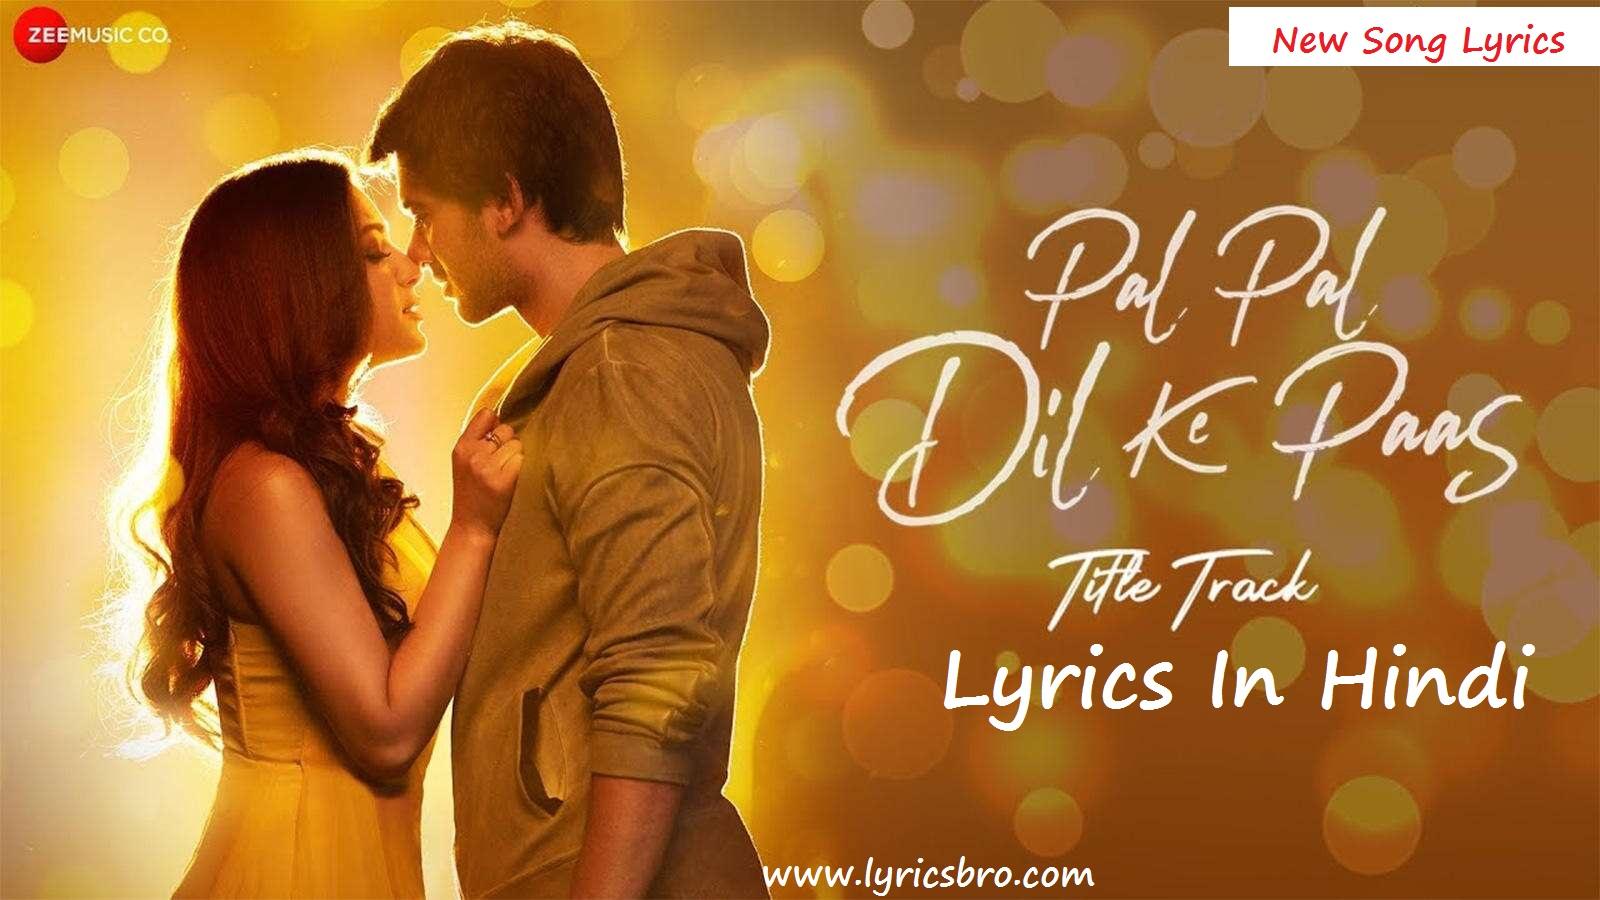 pal-pal-dil-ke-paas-new-song-lyrics, Arijit-Singh